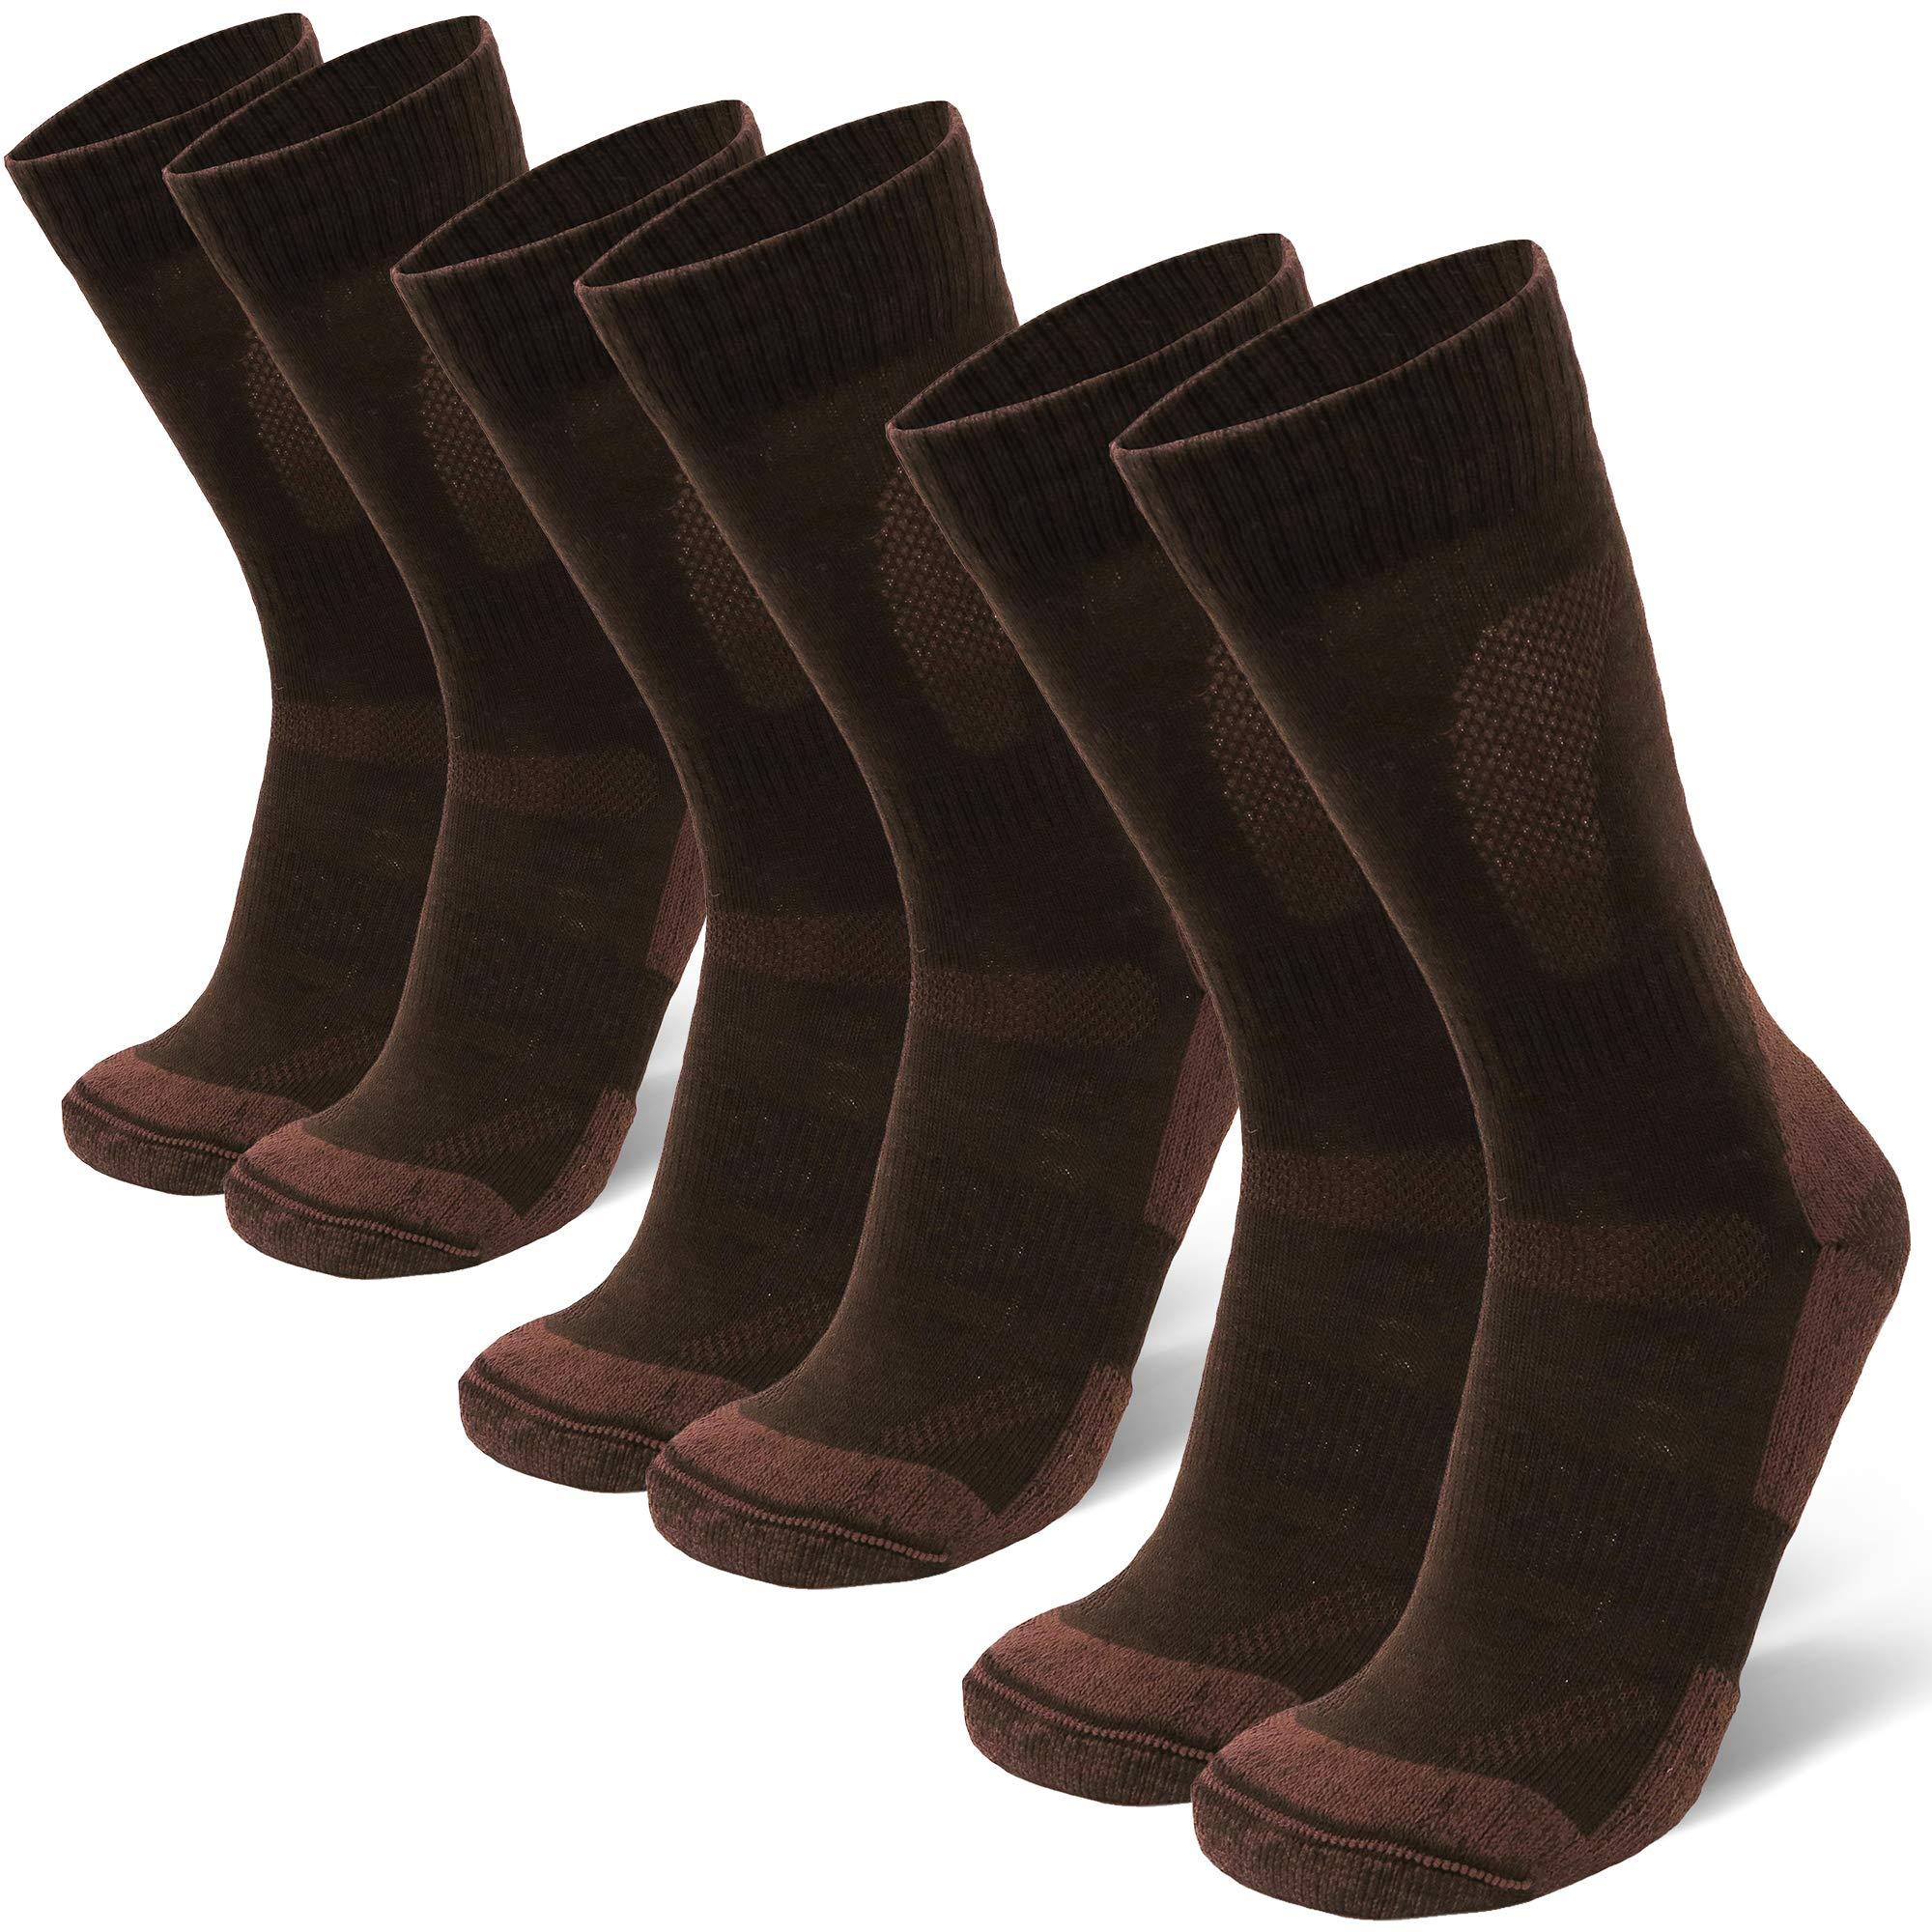 DANISH ENDURANCE Merino Wool Hiking & Trekking Socks (Oak Brown 3 Pairs, US Women 11-13 // US Men 9.5-12.5) by DANISH ENDURANCE